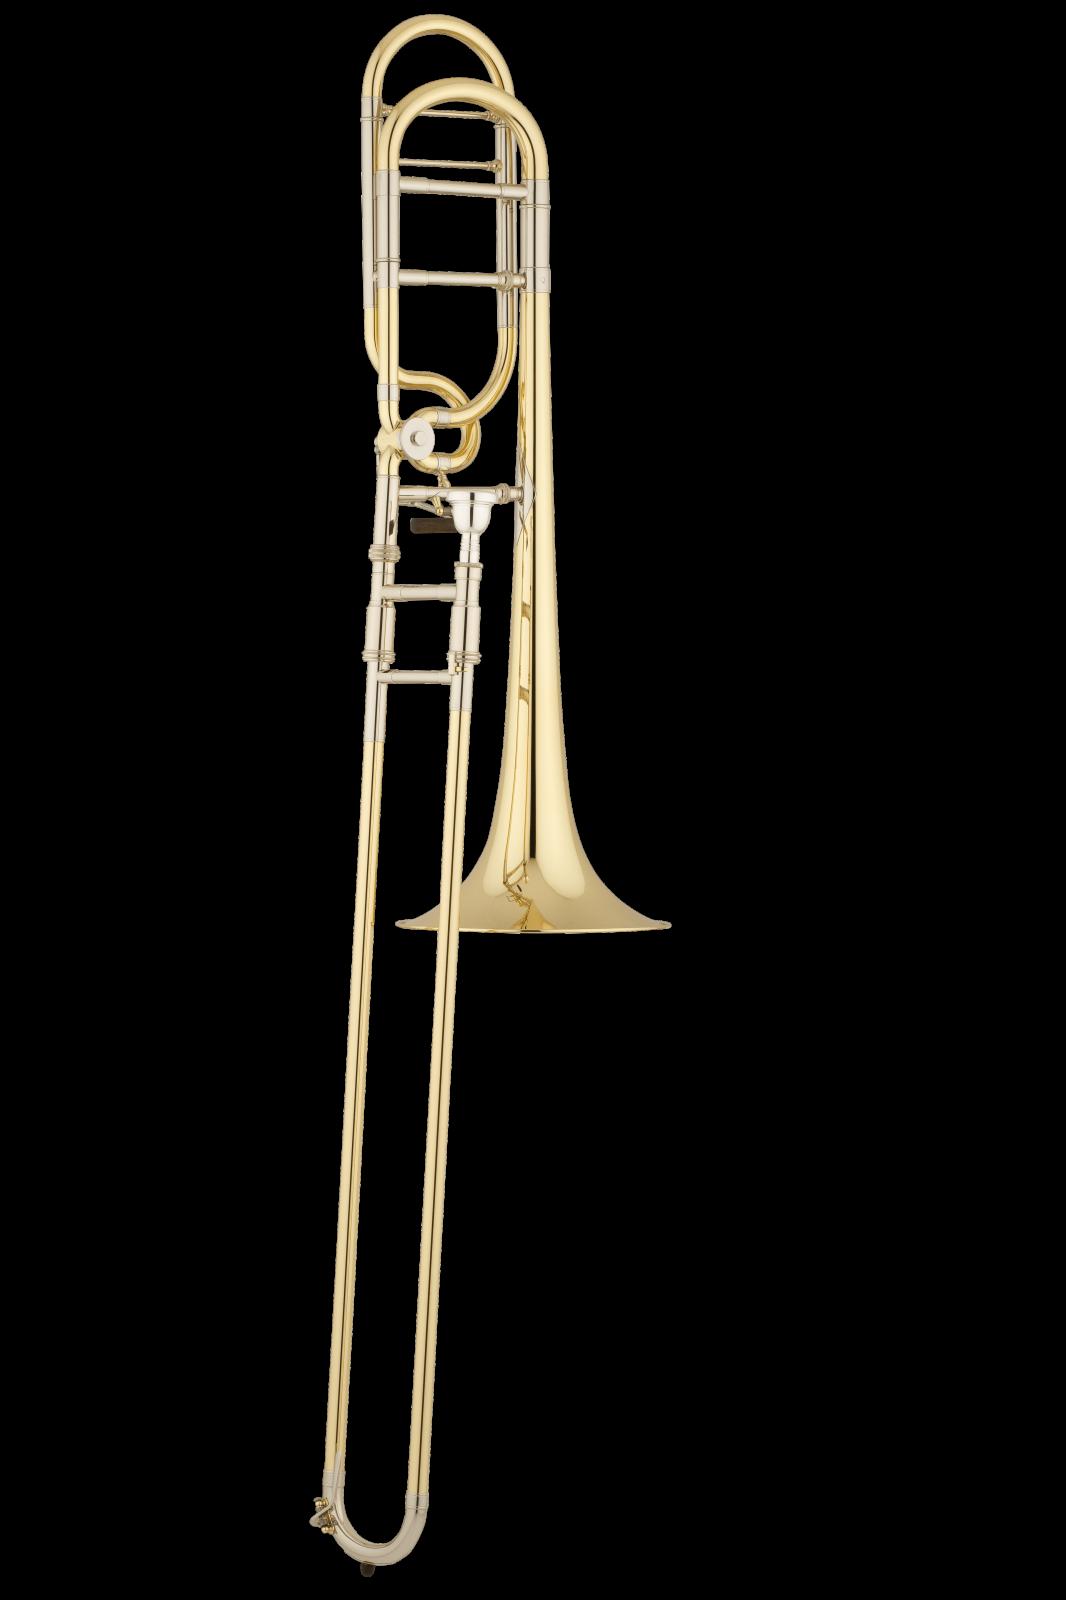 Shires Trombone Q Series TBQ30YR